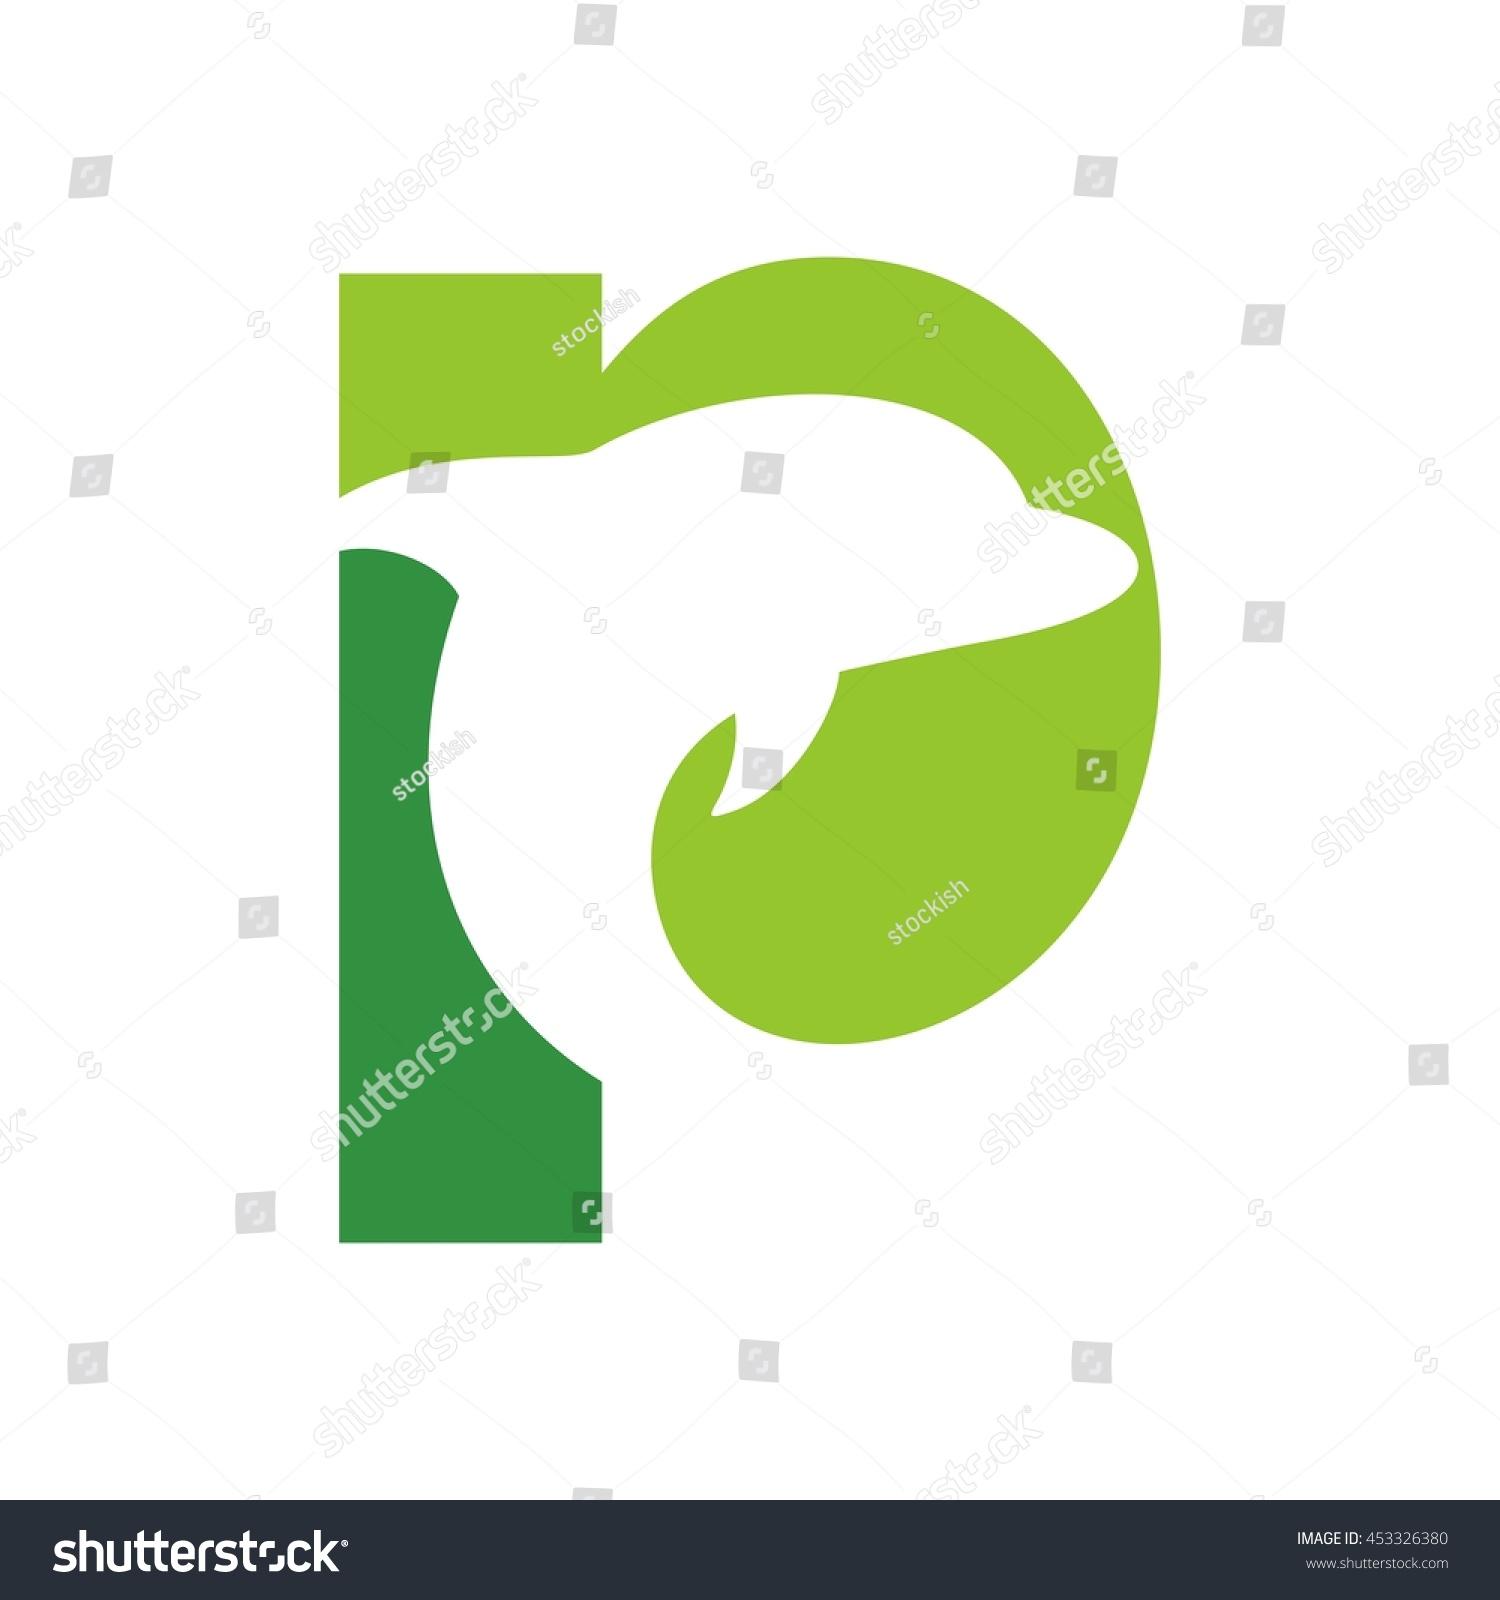 Dolphin Logo Vector Stock Vector 453326380 - Shutterstock